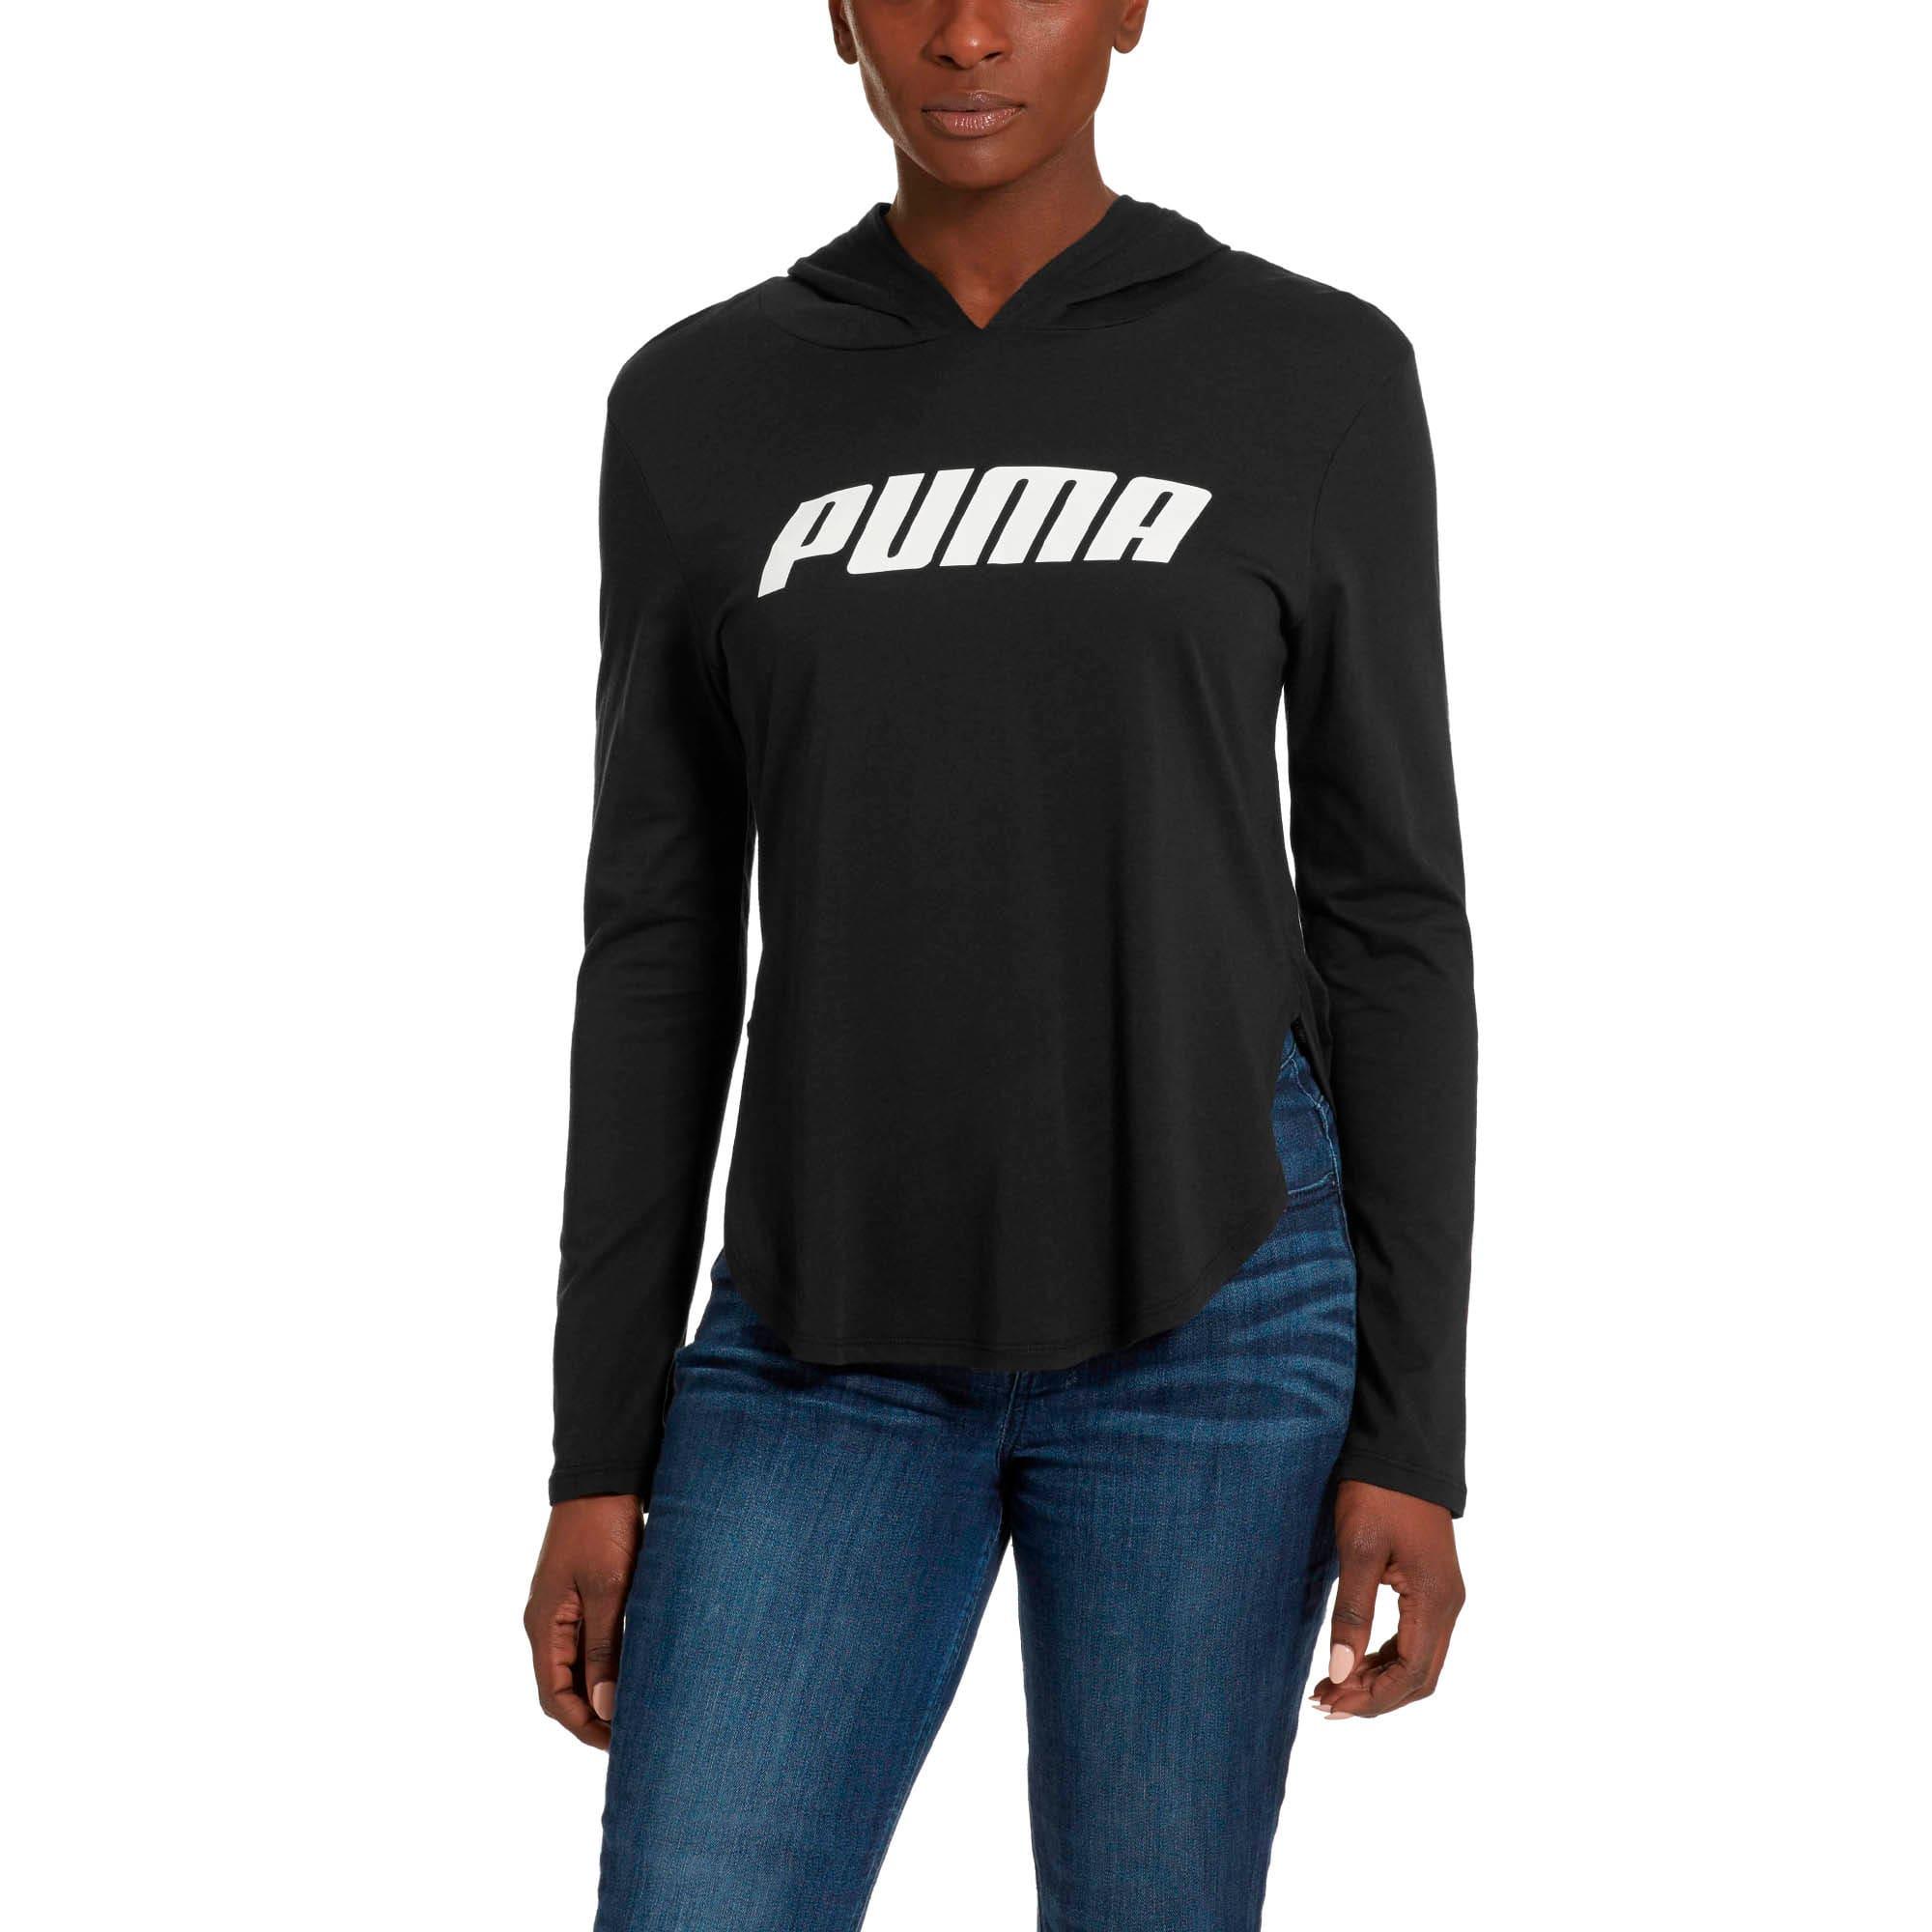 Thumbnail 1 of Modern Sports Light Cover up, Puma Black, medium